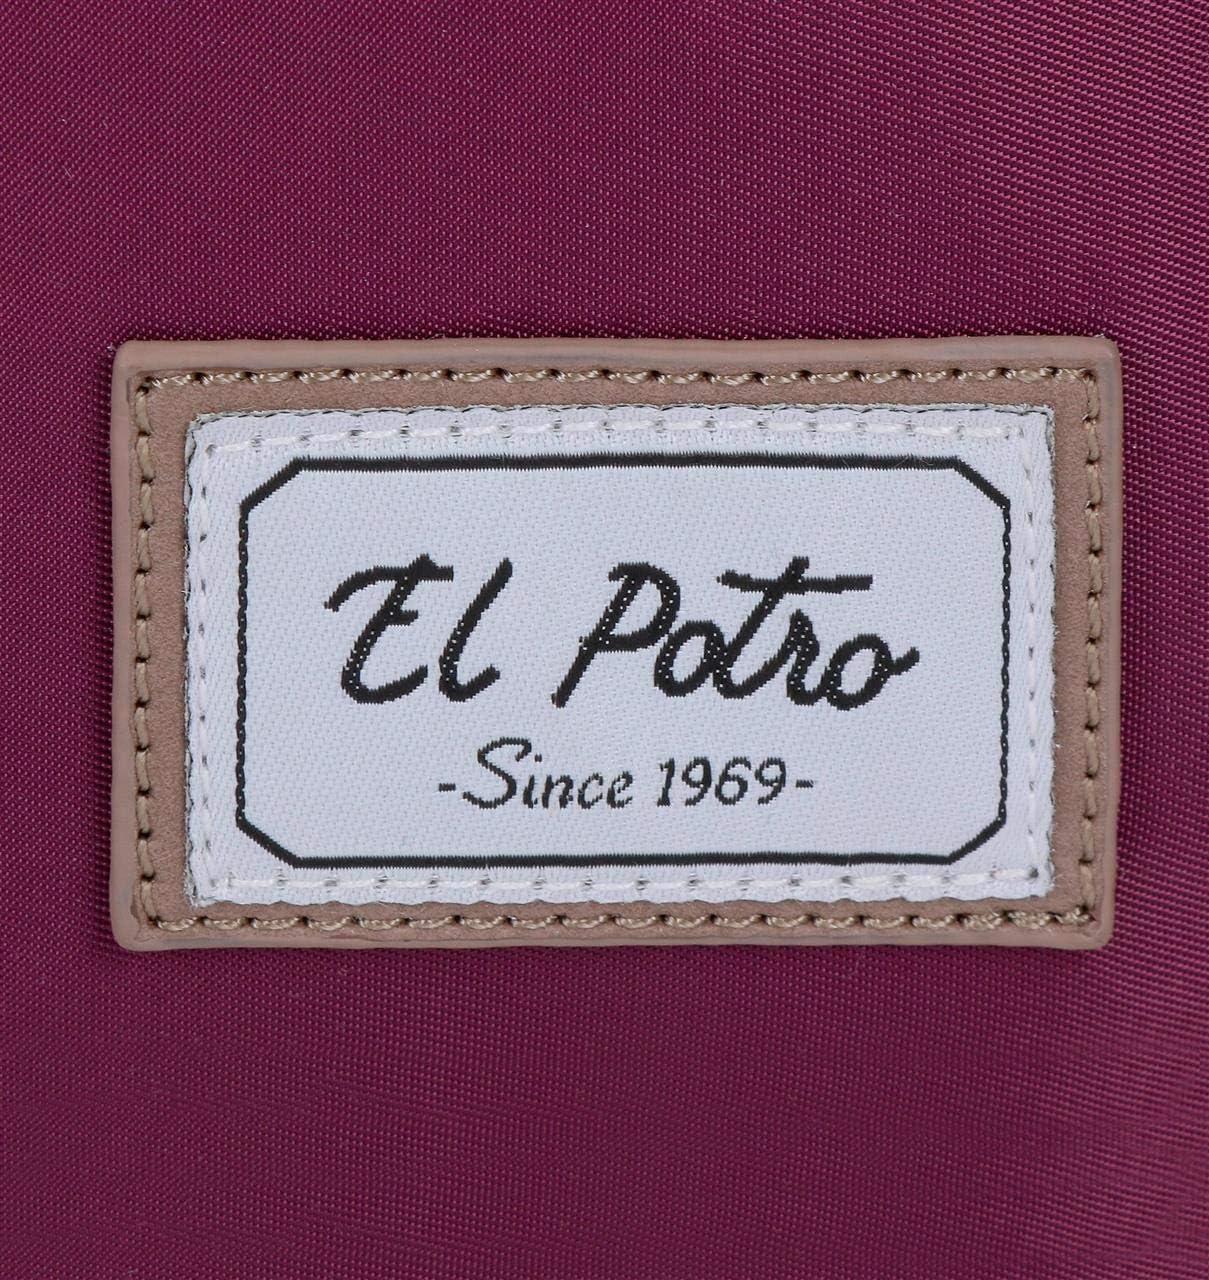 Lila El Potro Pipe Mochila Mujer para Port/átil 35 x 25 x 10 cm